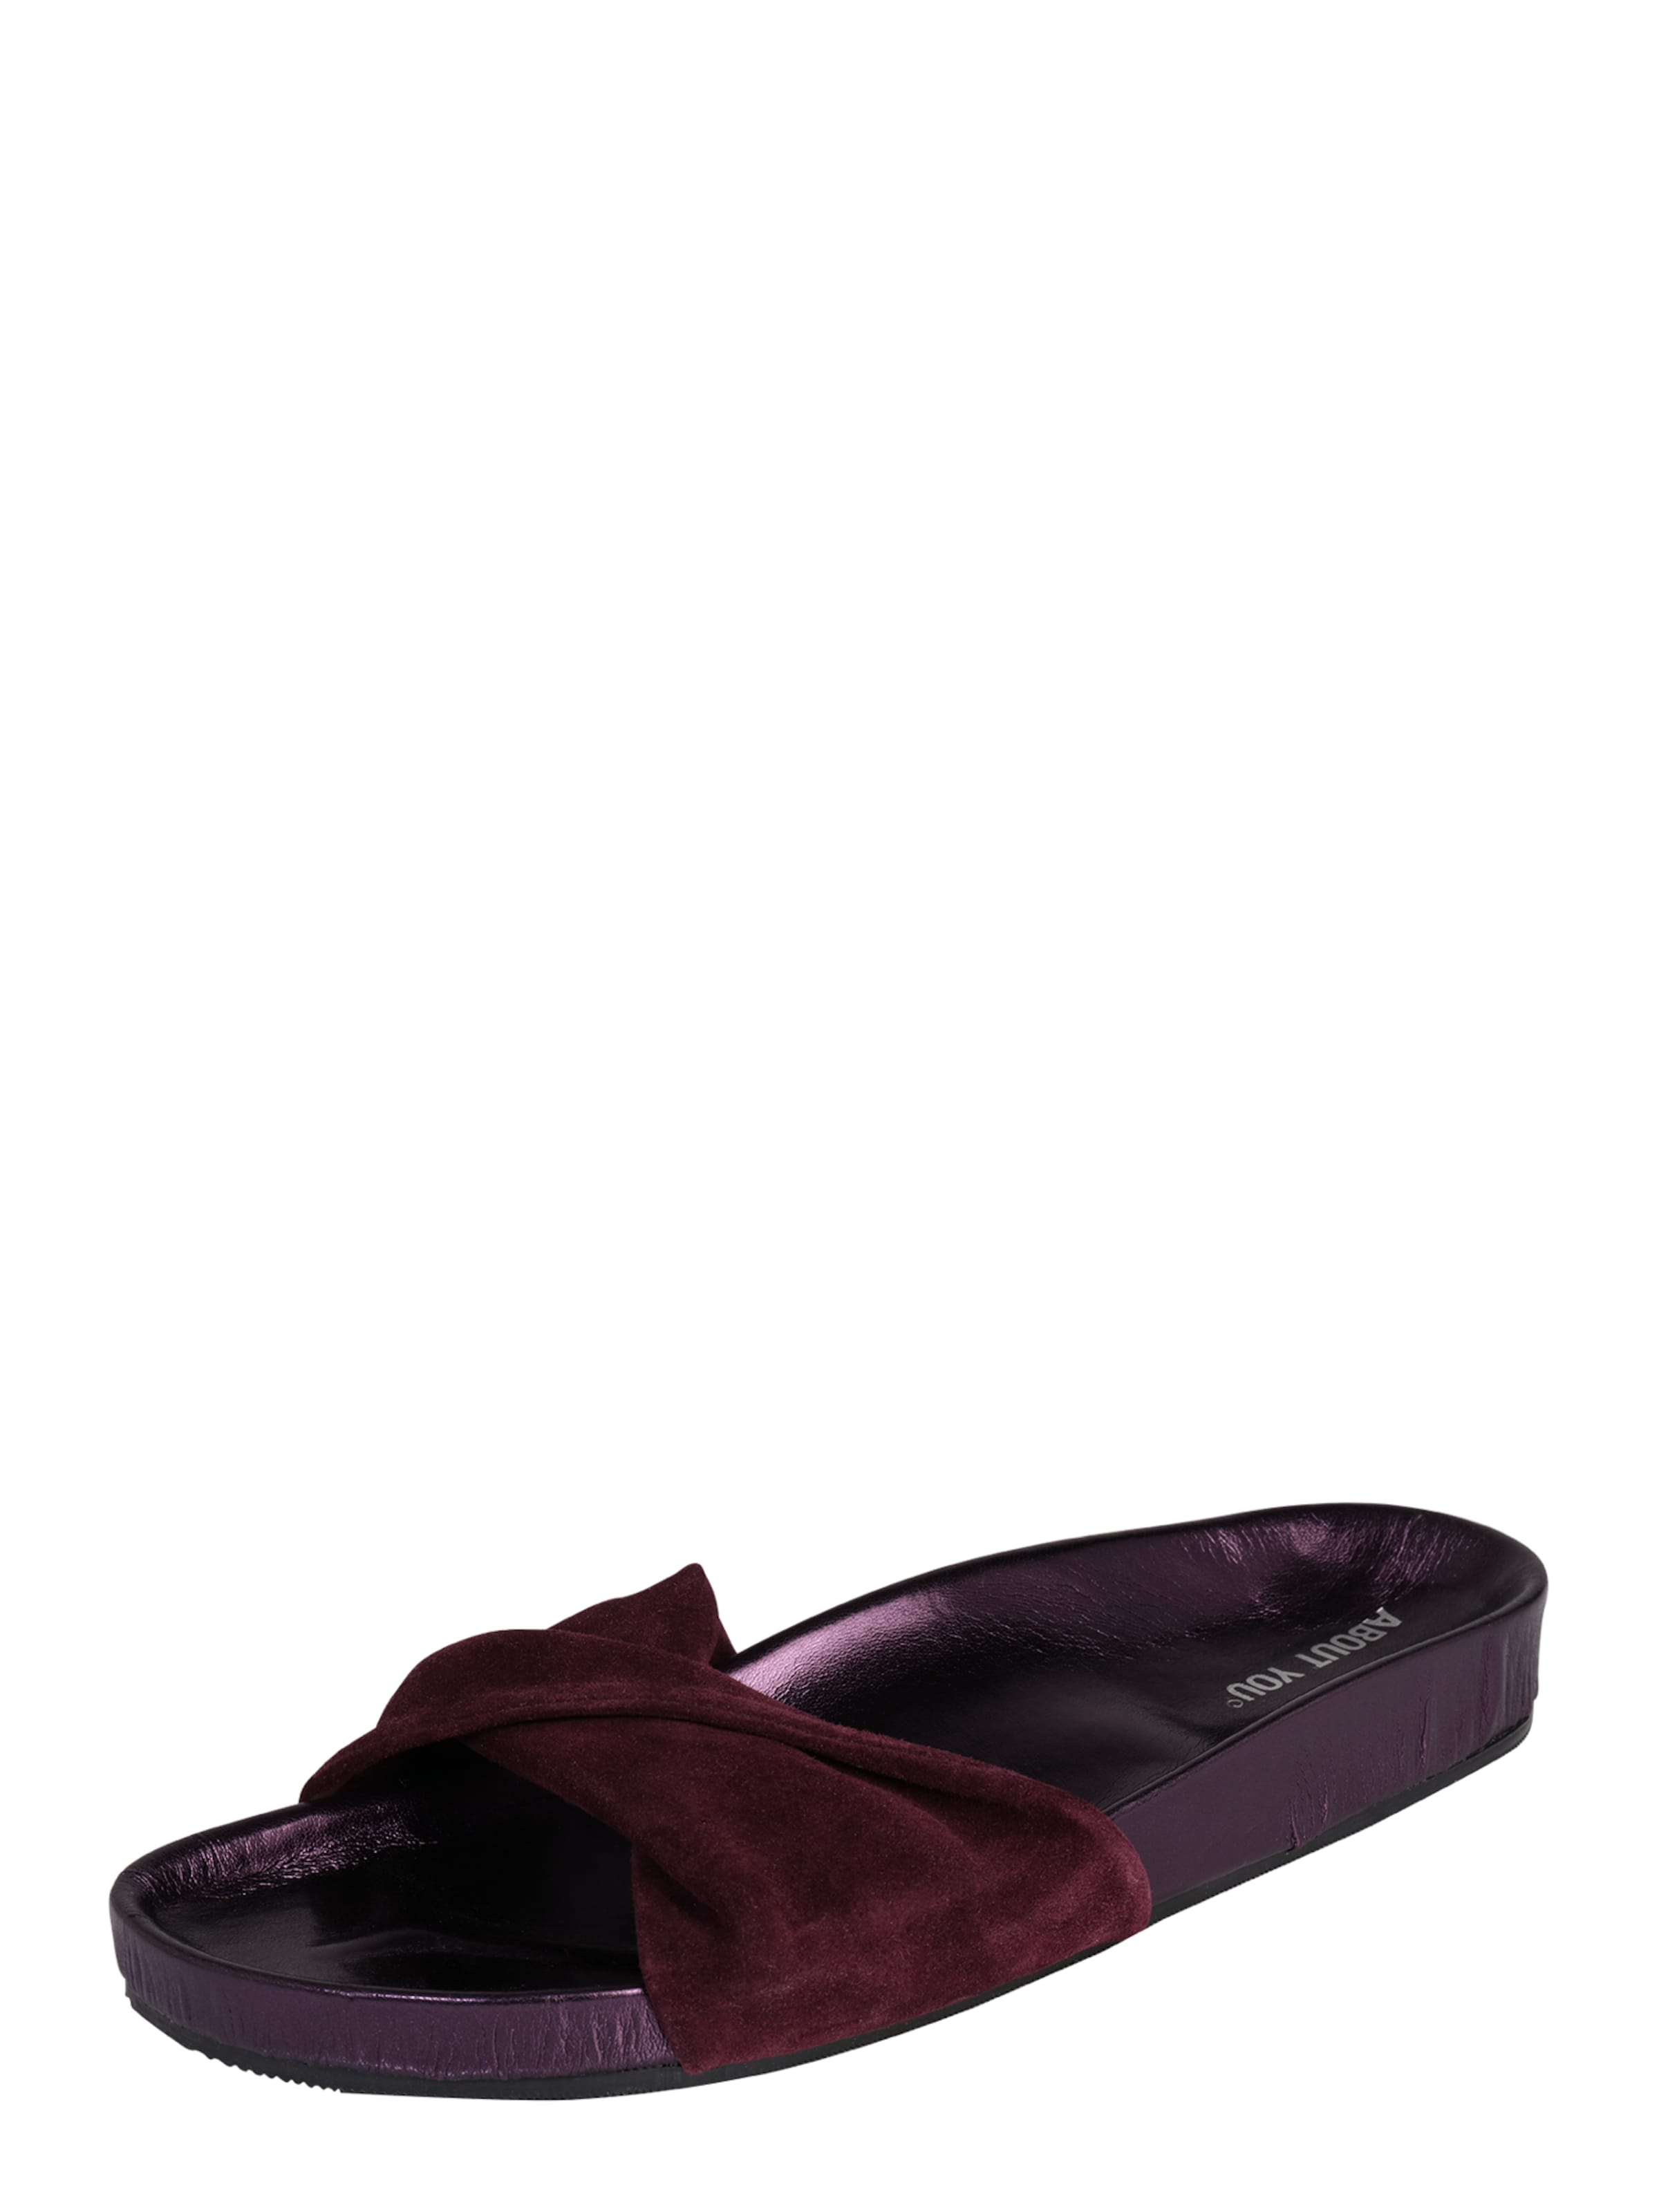 ABOUT YOU Pantolette Annabelle Verschleißfeste billige Schuhe